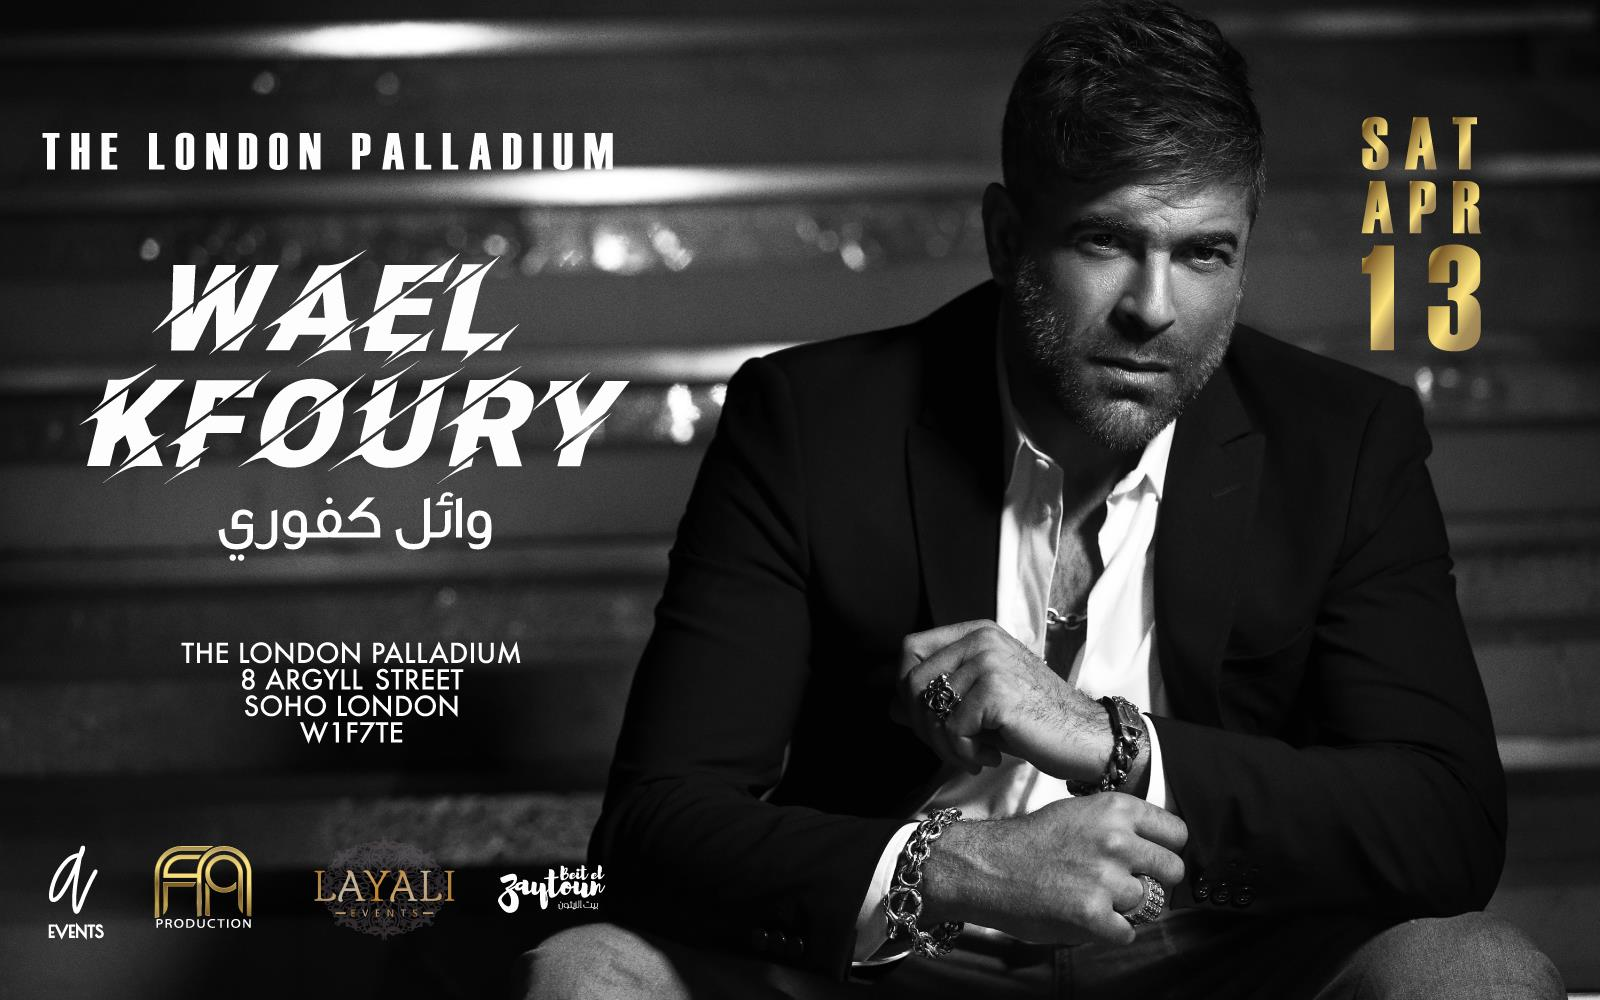 Wael Kfoury Tickets, The London Palladium – Official Box Office